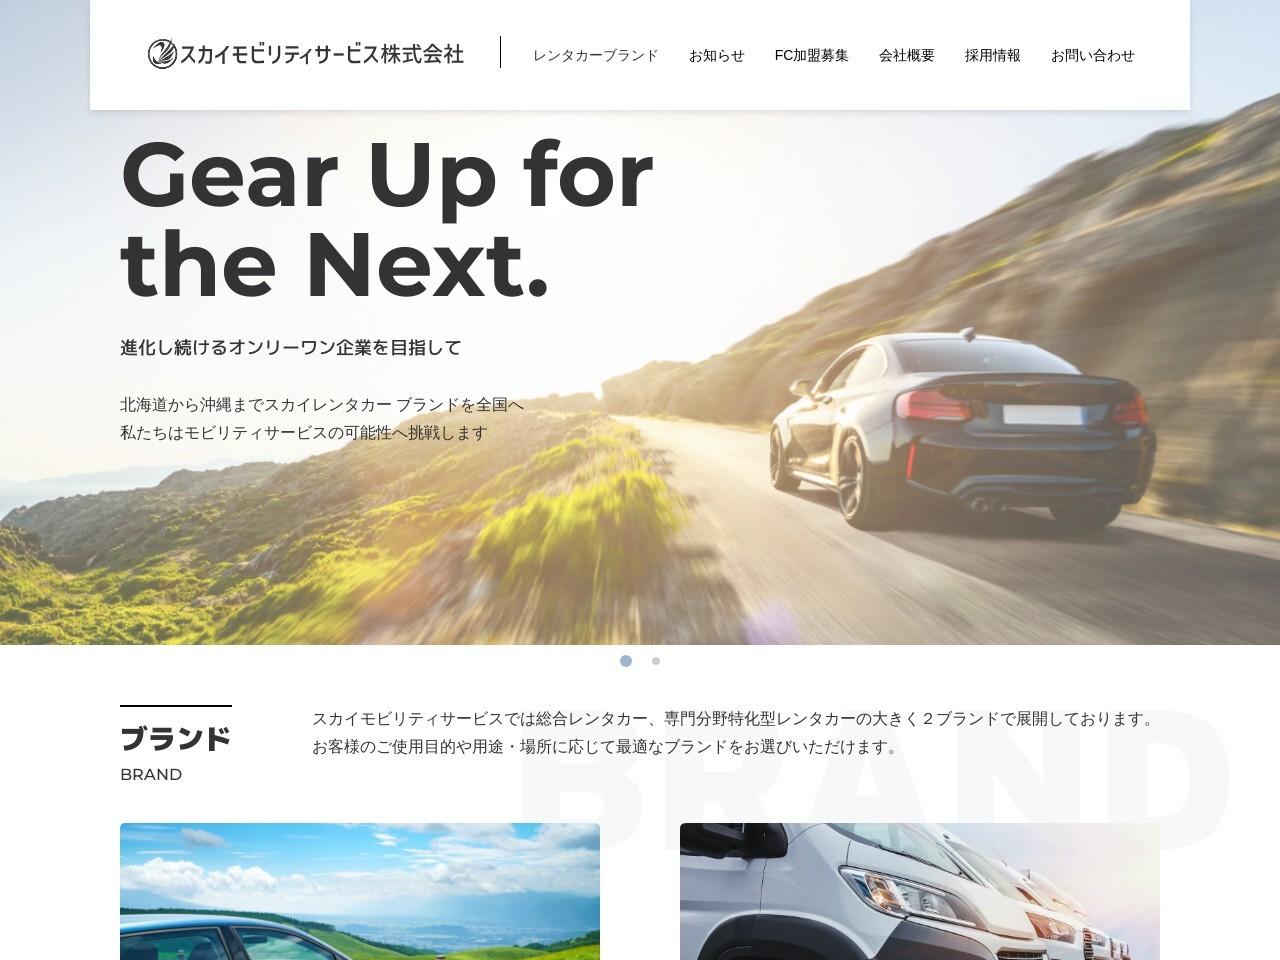 J‐ネットレンタカー平塚田村店